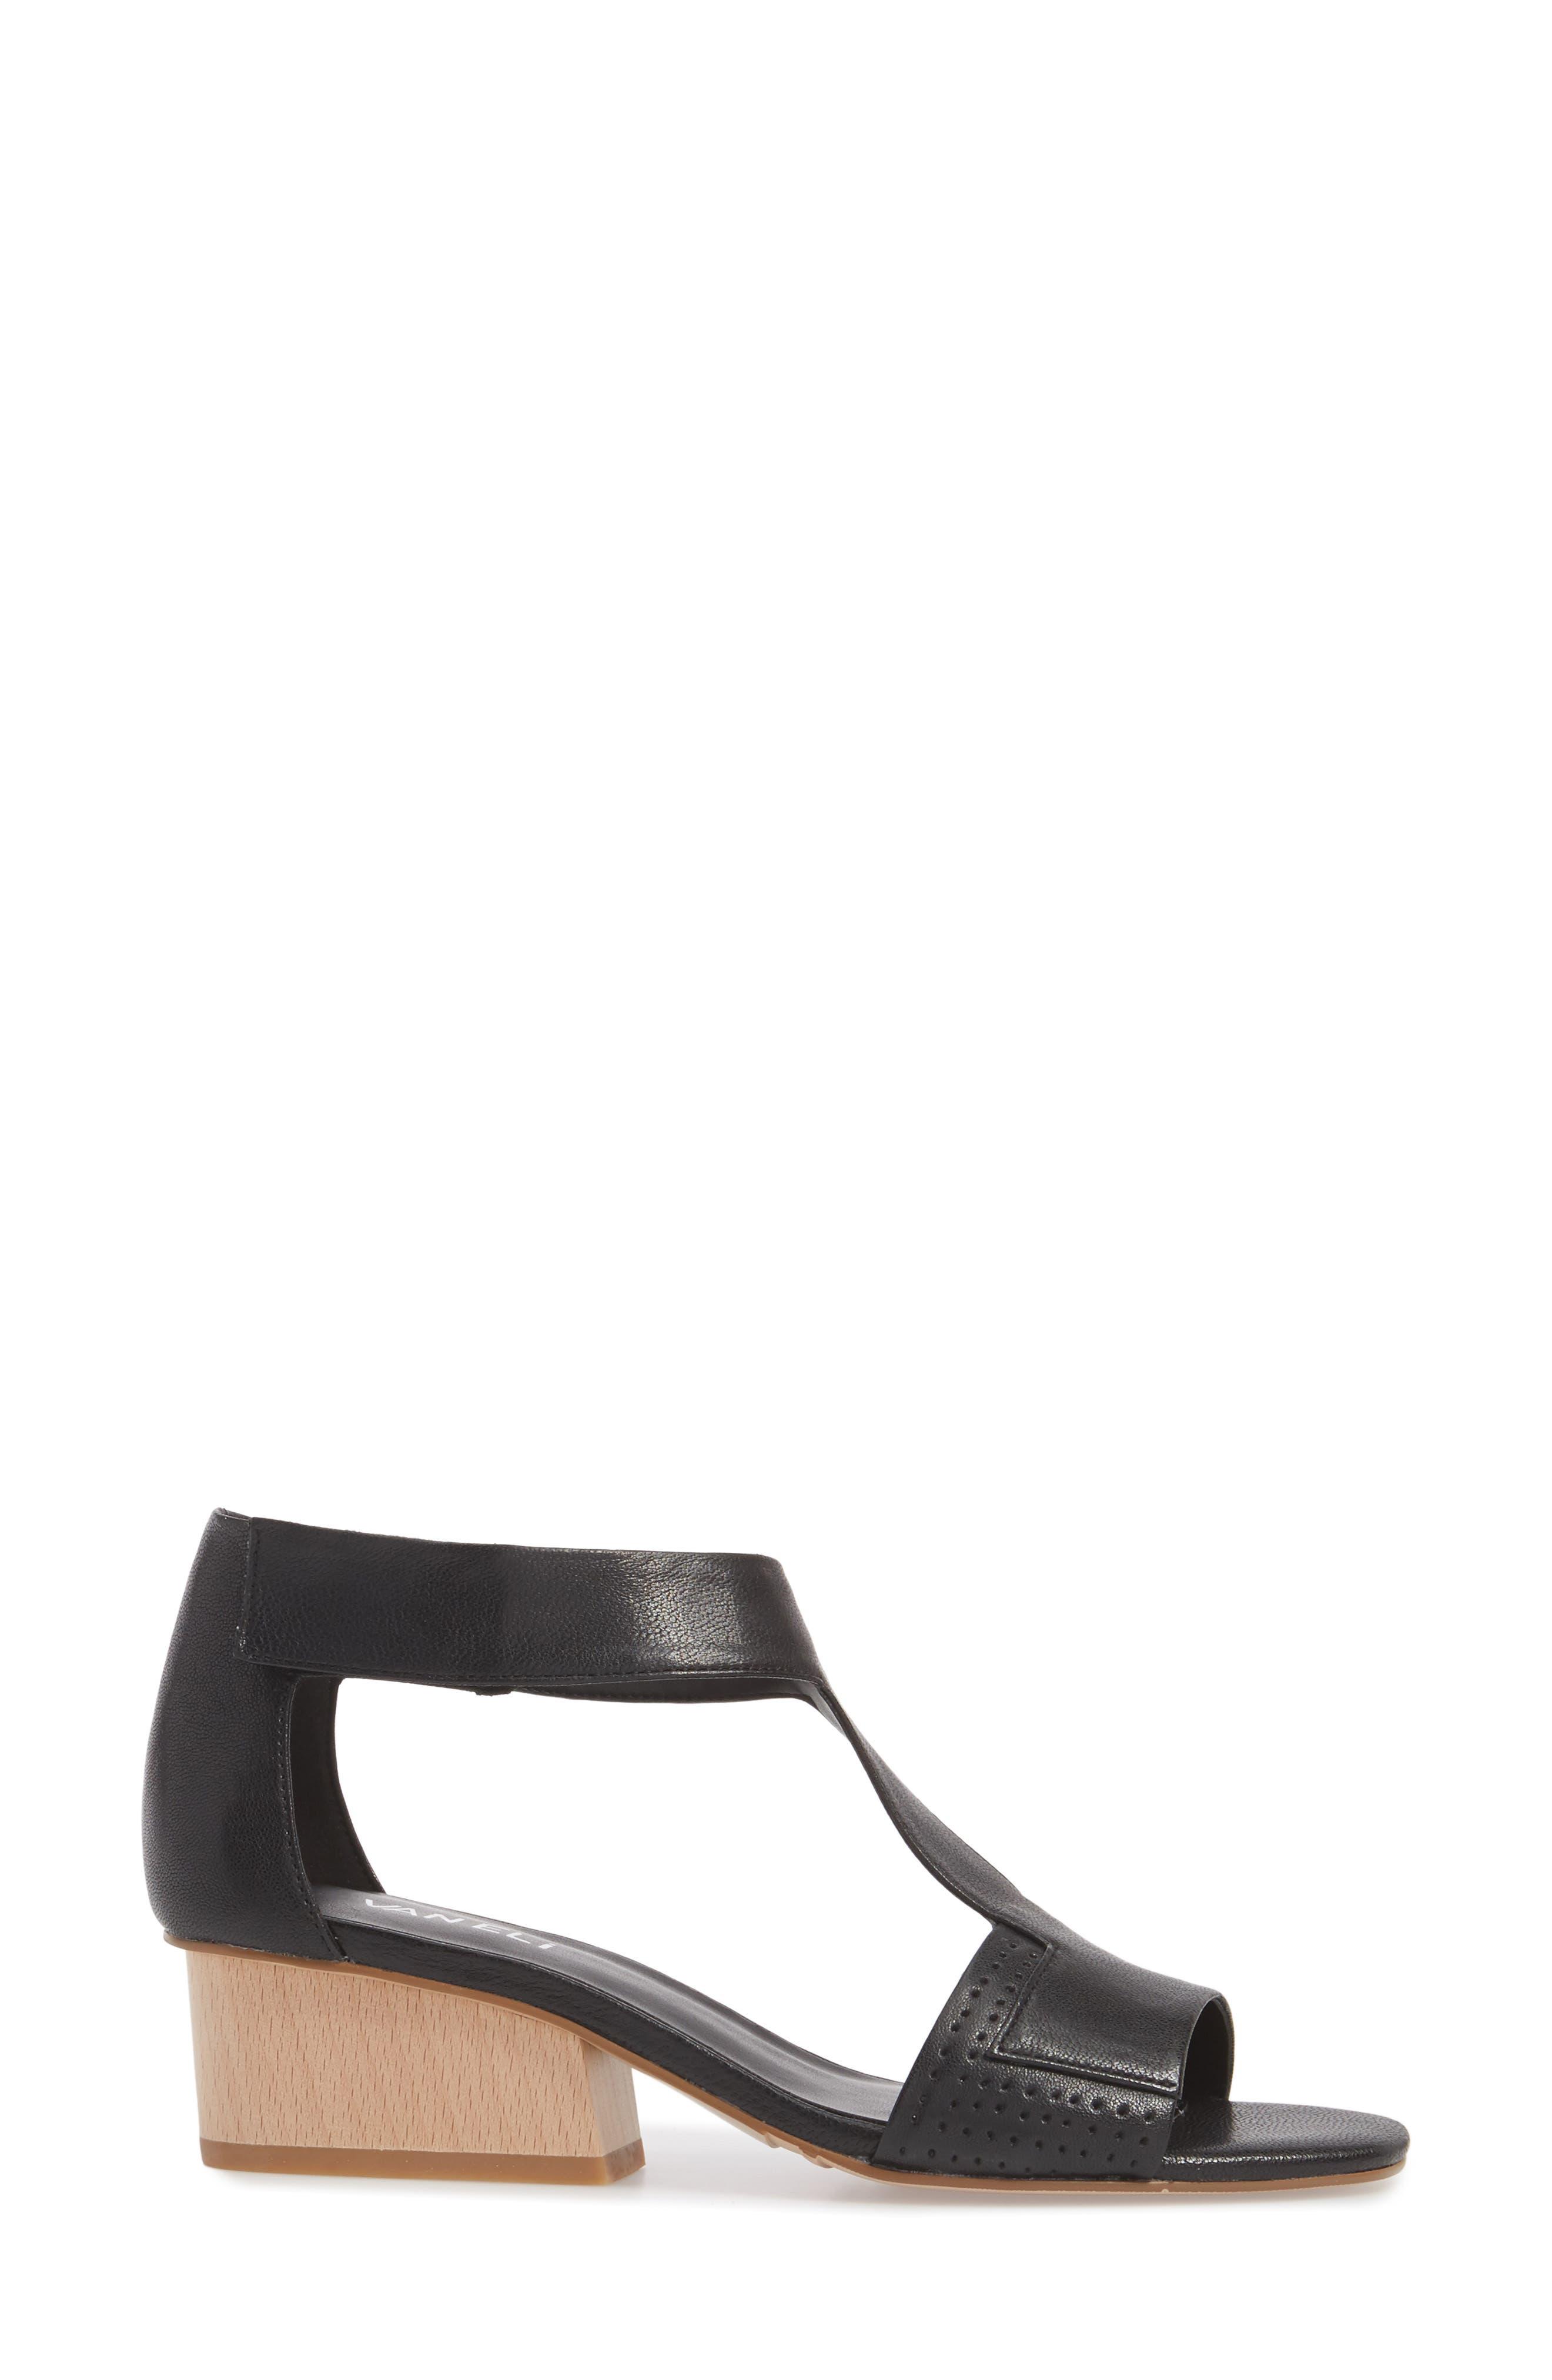 Calyx Block Heel Sandal,                             Alternate thumbnail 3, color,                             BLACK LEATHER